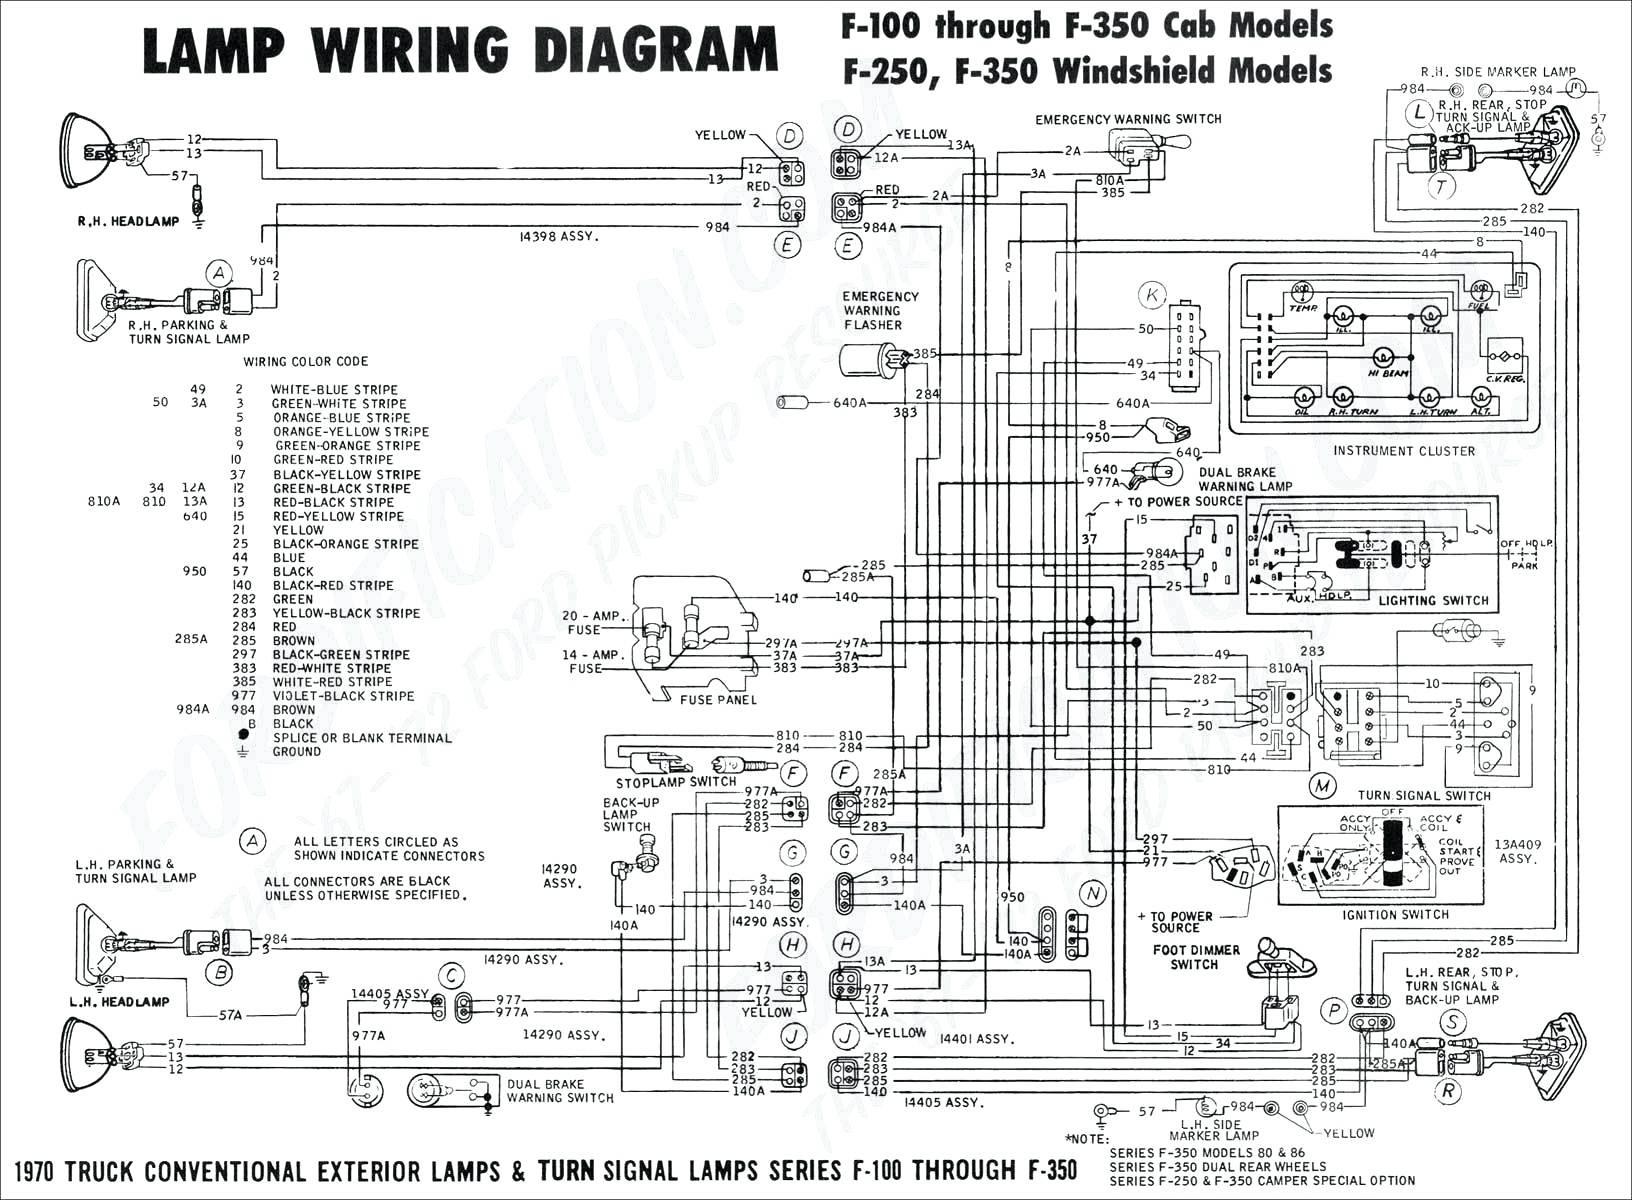 Dodge Ram 2007 Wiring Diagram 1998 Dodge Ram 150engine Diagram Diagram Base Website Of Dodge Ram 2007 Wiring Diagram